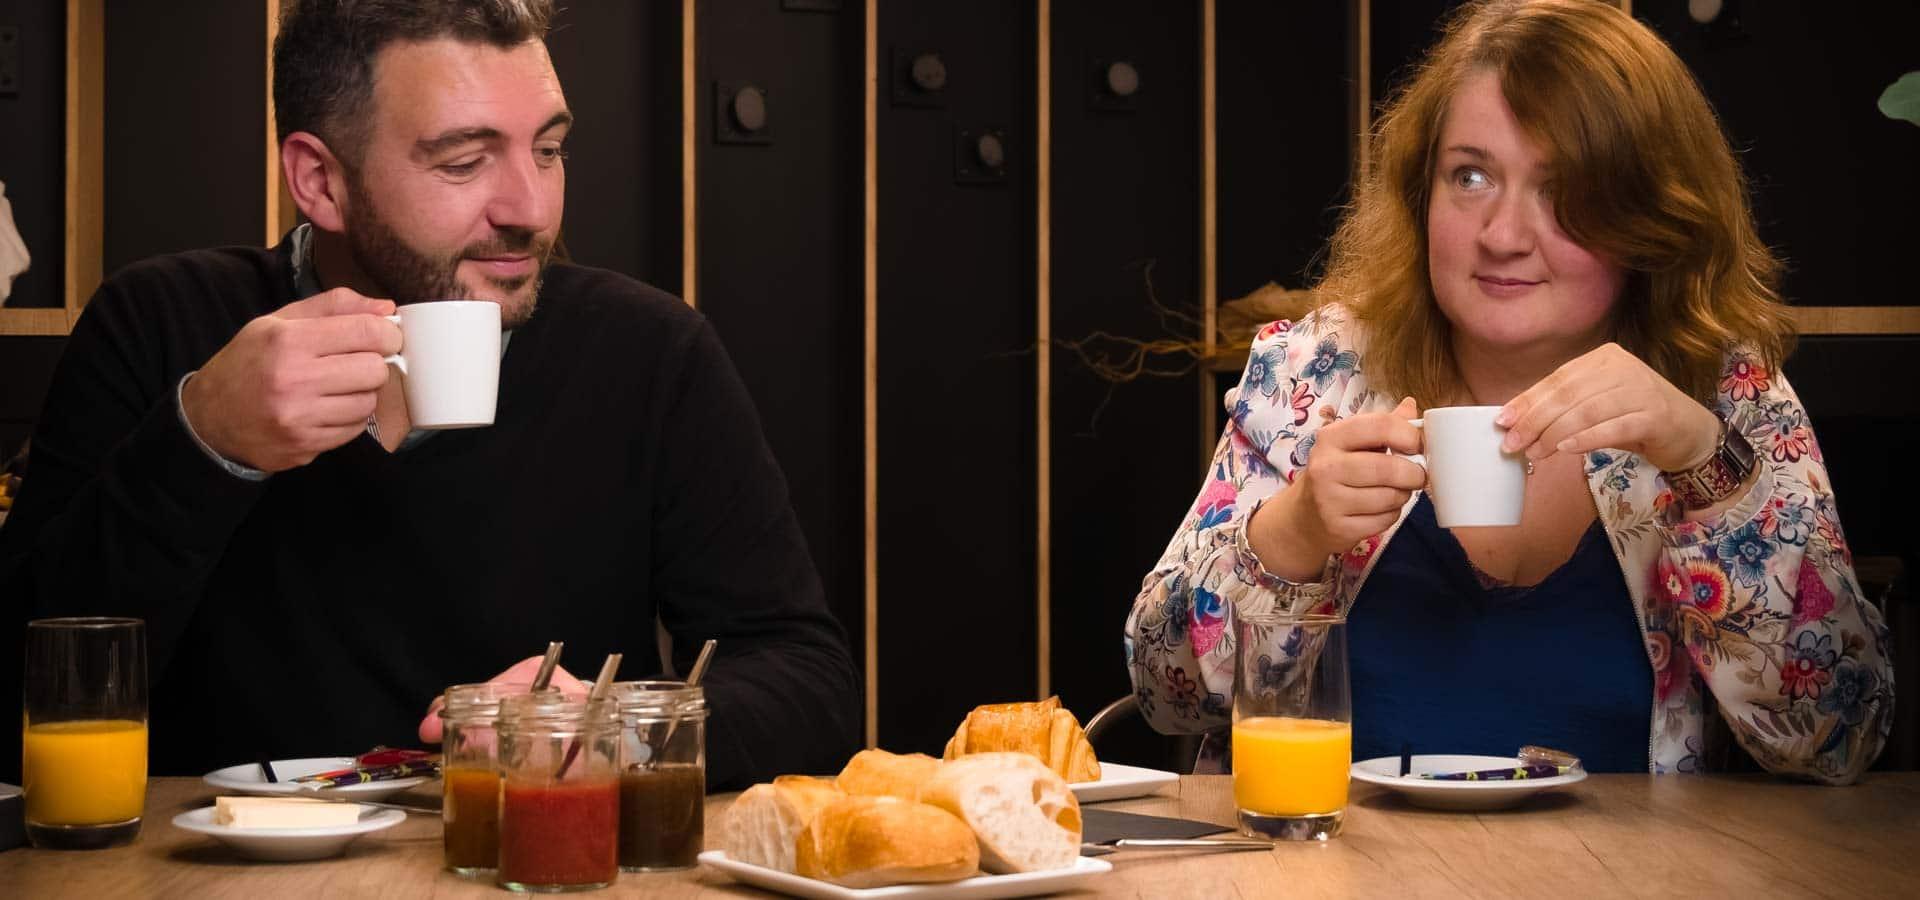 petit-dejeuner-rennes-potofeu